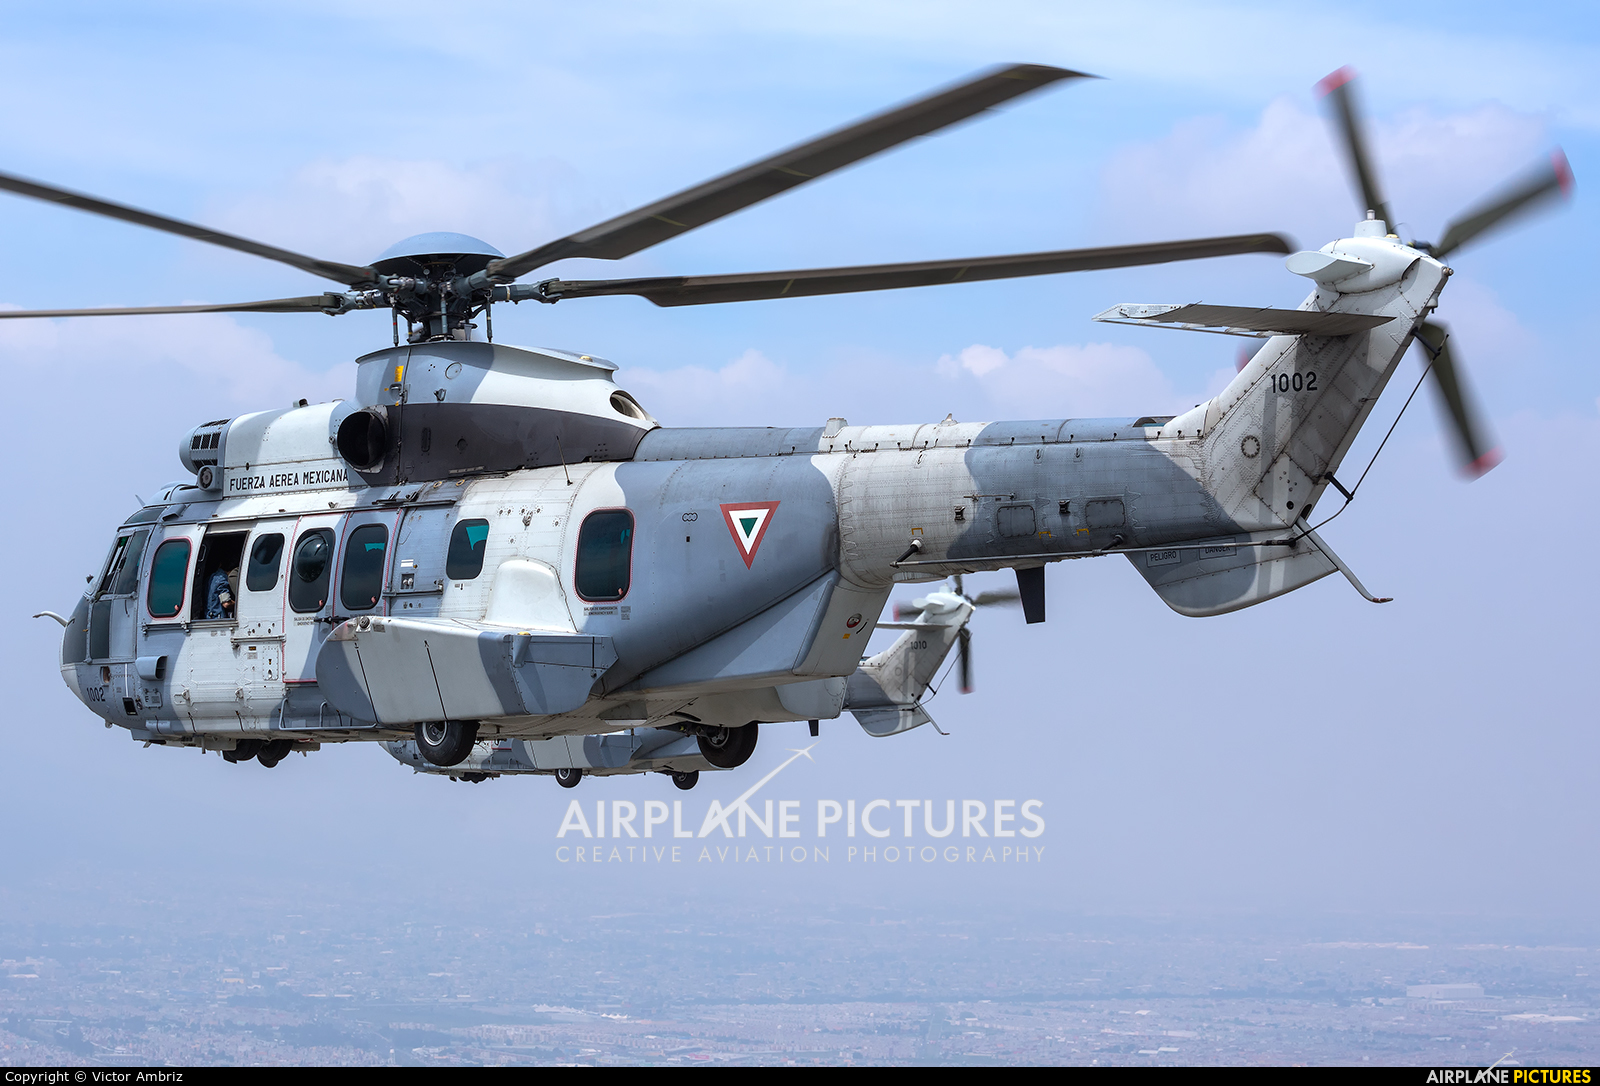 Mexico - Air Force 1002 aircraft at In Flight - Mexico